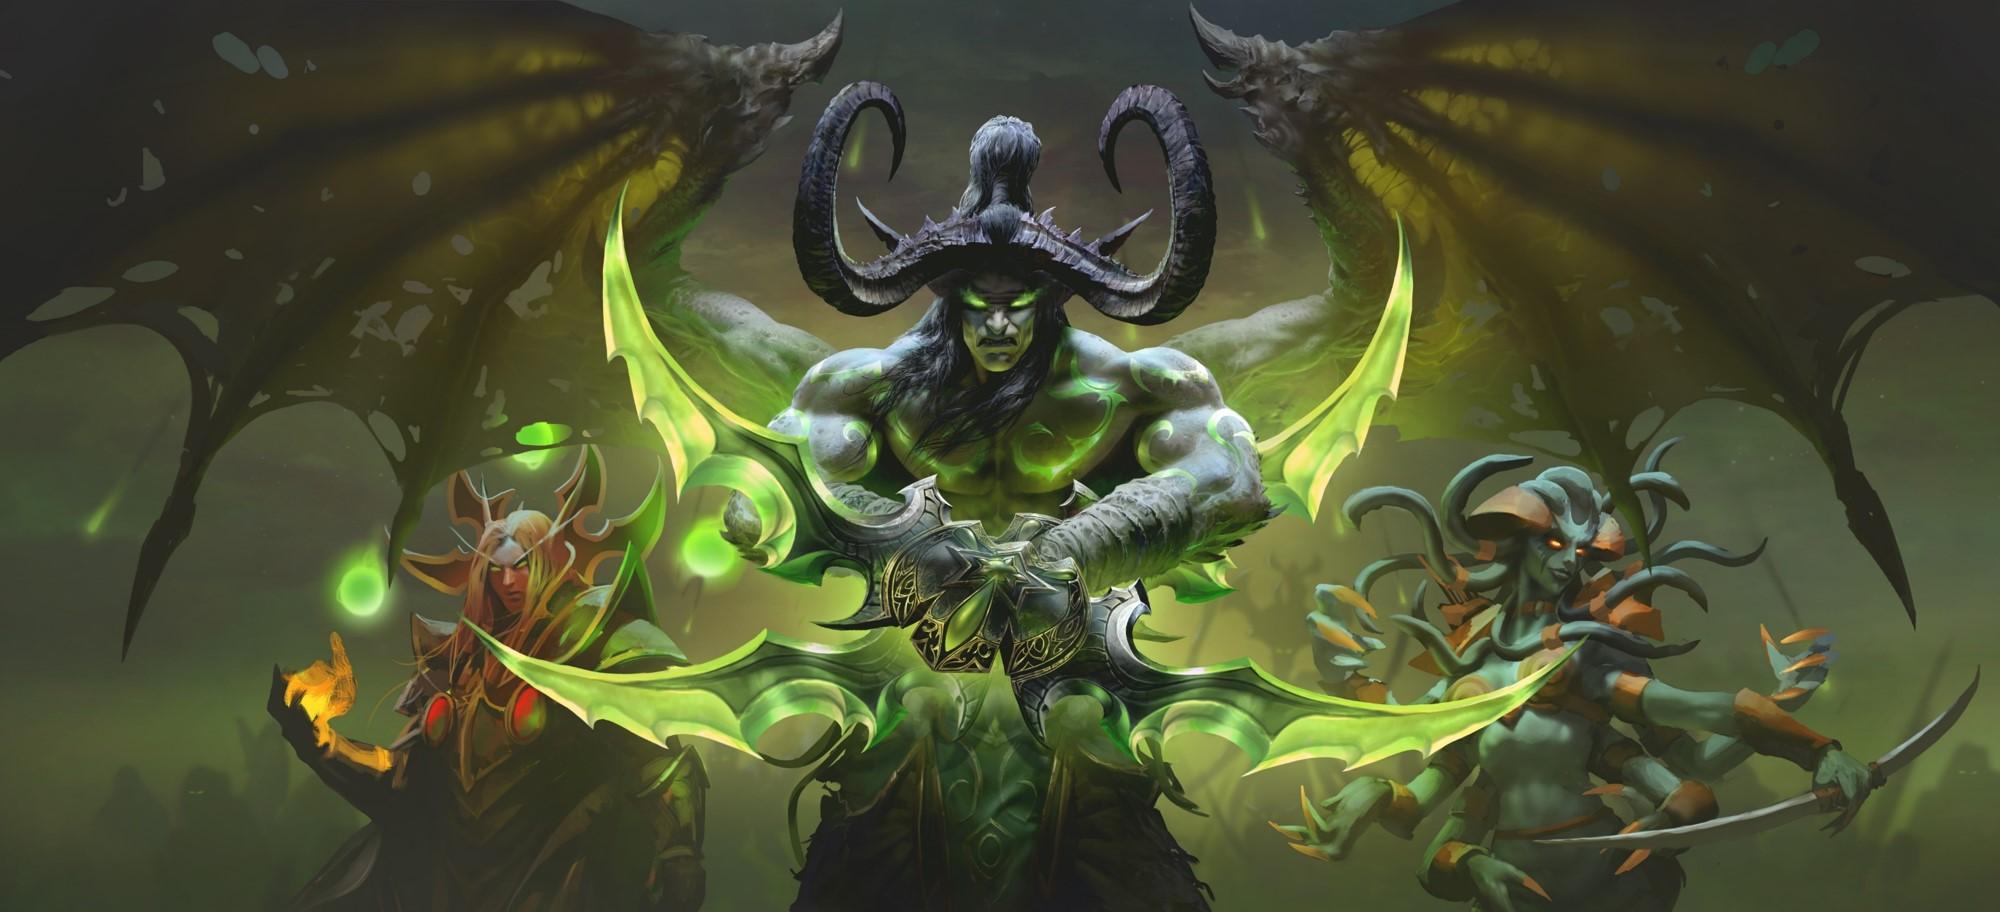 World of Warcraft: Burning Crusade Classic - Illidan Stormrage, Kael'thas Sunstrider, and Lady Vashj all pose menacingly for the camera.